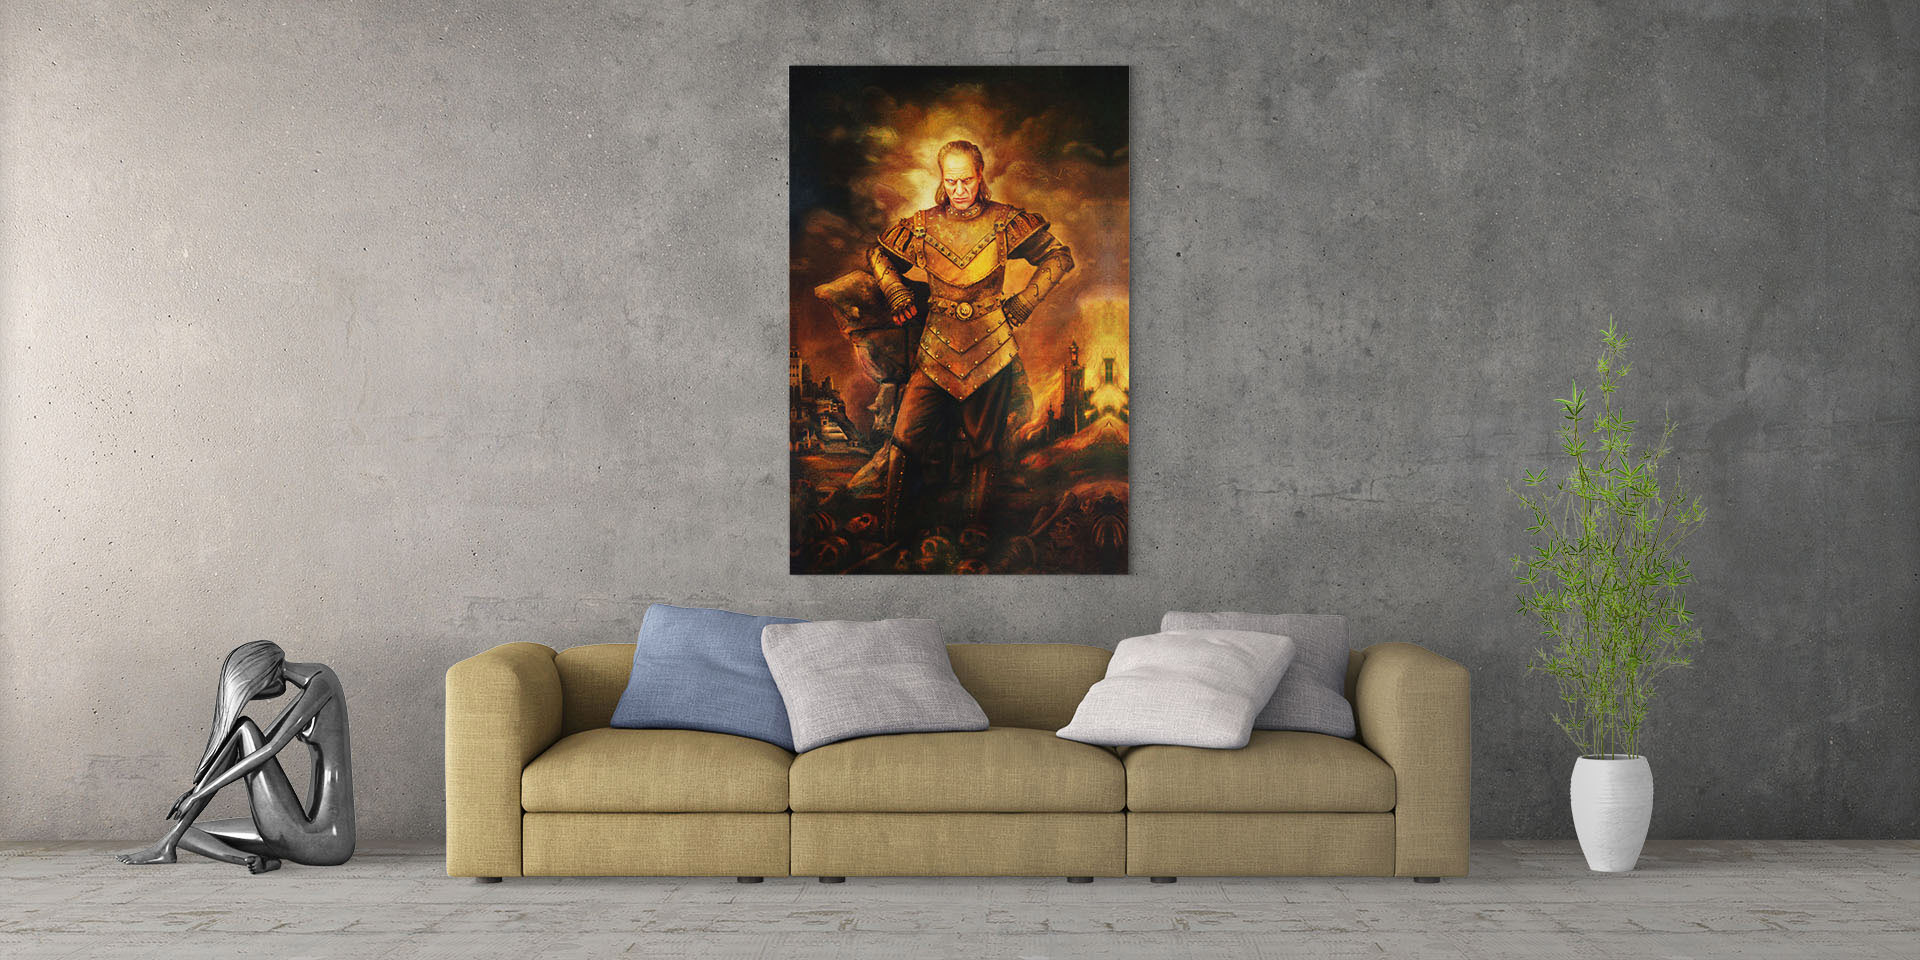 Vigo the Carpathian Framed Canvas Replica Print from Ghostbusters II above Sofa